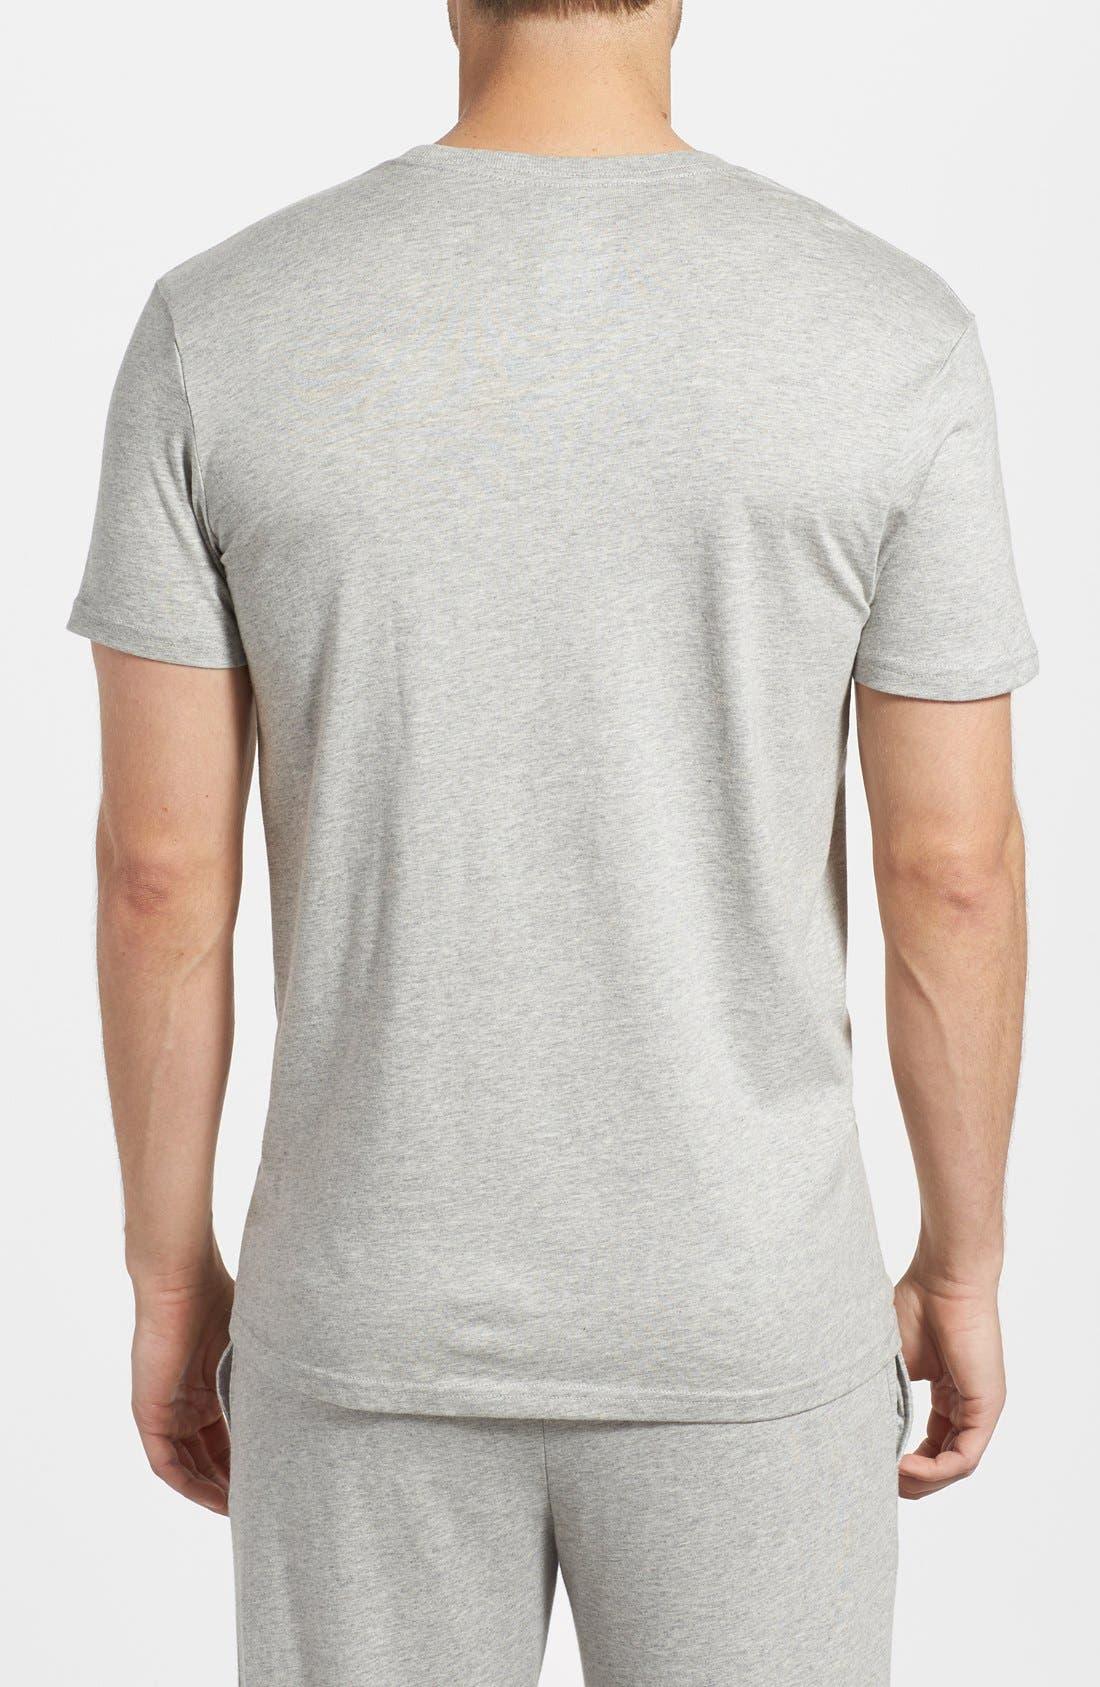 POLO RALPH LAUREN, Crewneck T-Shirt, Alternate thumbnail 2, color, ANDOVER HEATHER